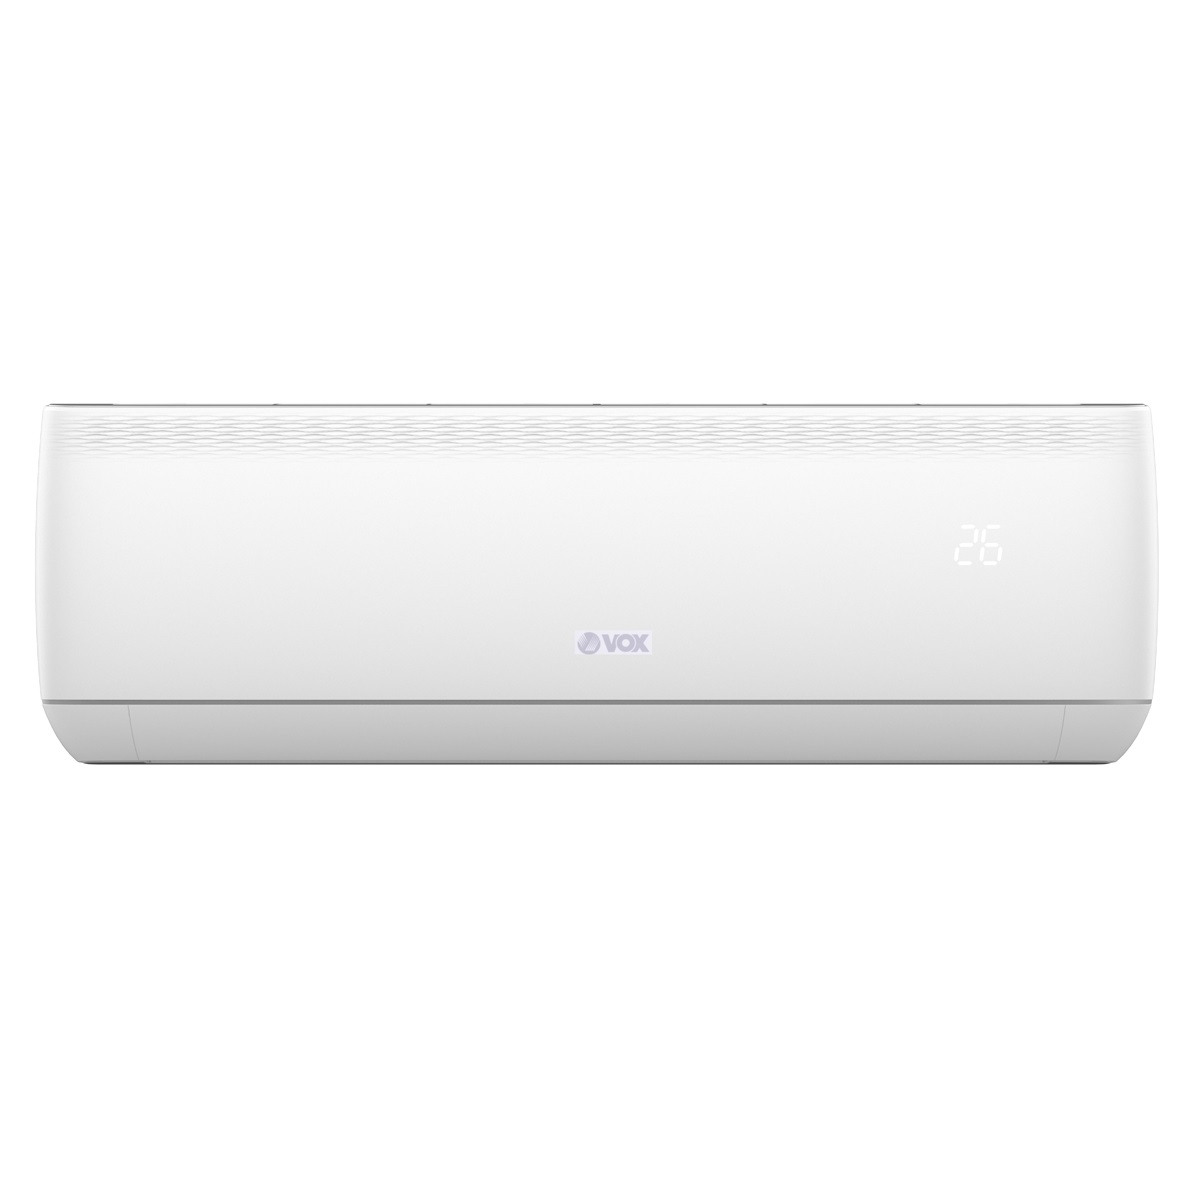 VOX klima uređaj inverter IVA1-24JR - Inelektronik